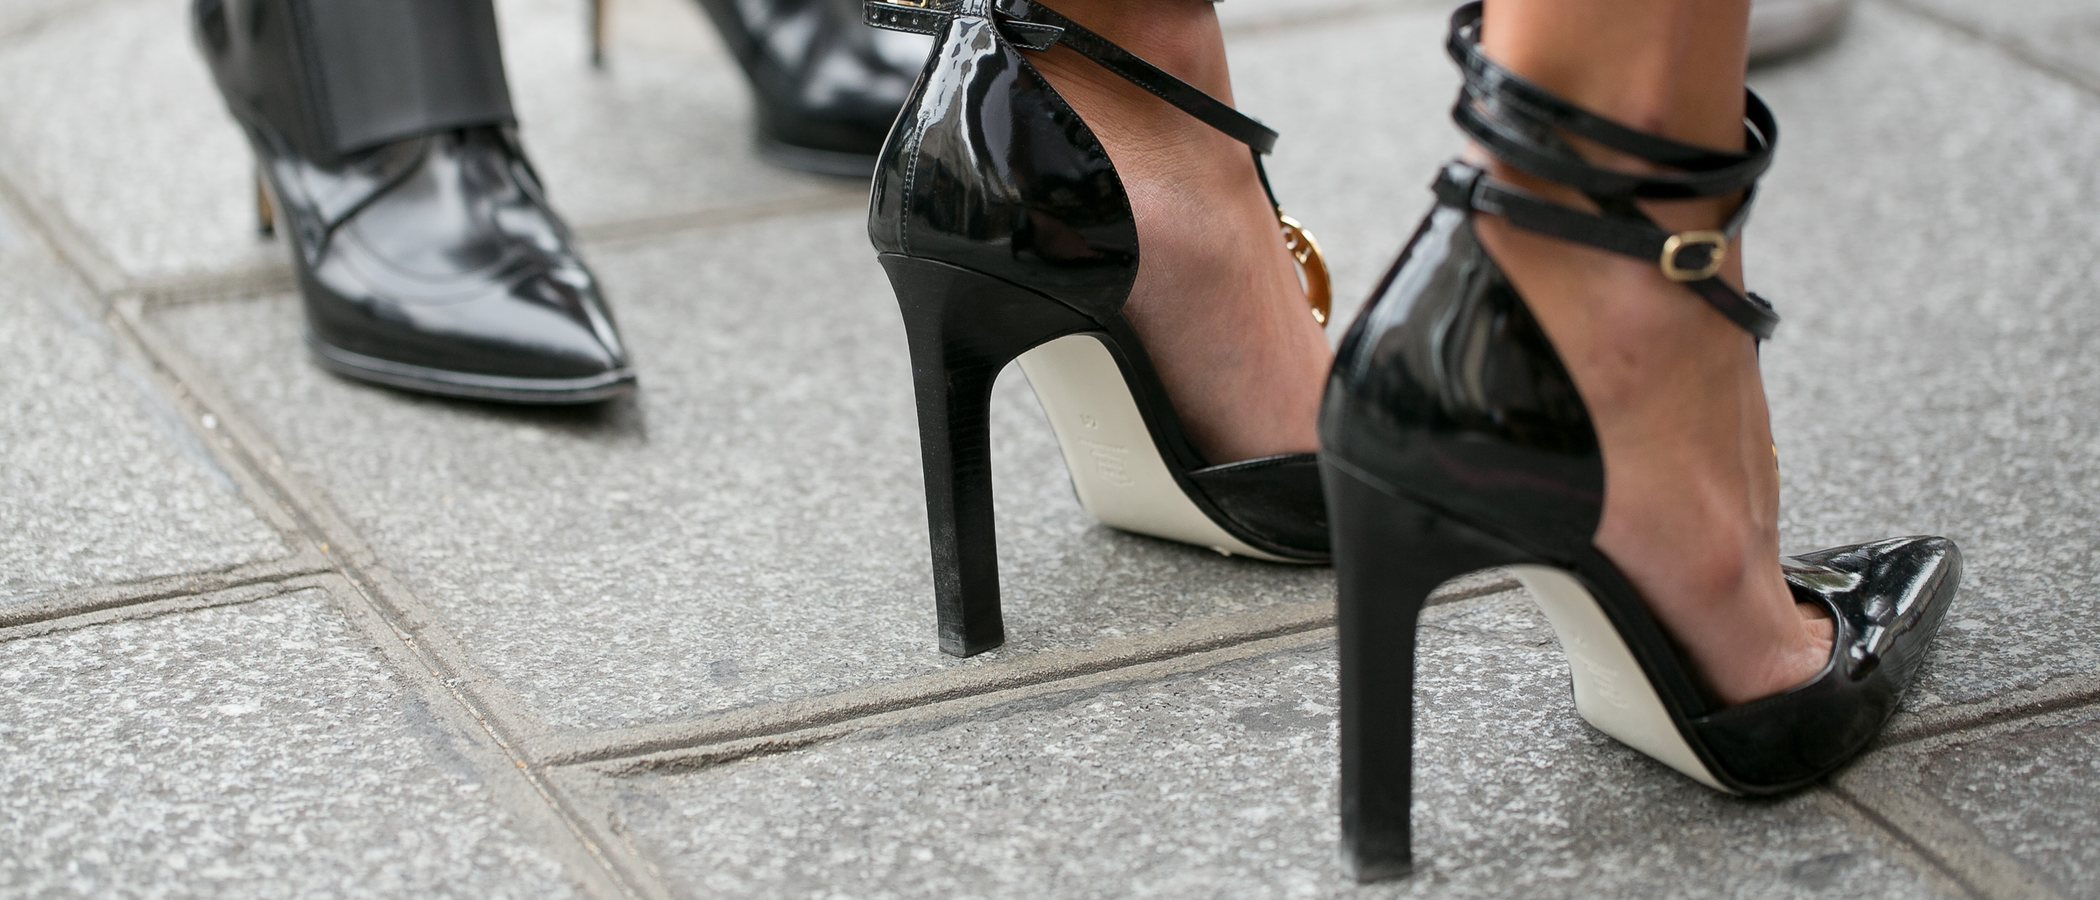 dd5d5c9f52b Consejos para elegir zapatos de fiesta - Bekia Moda